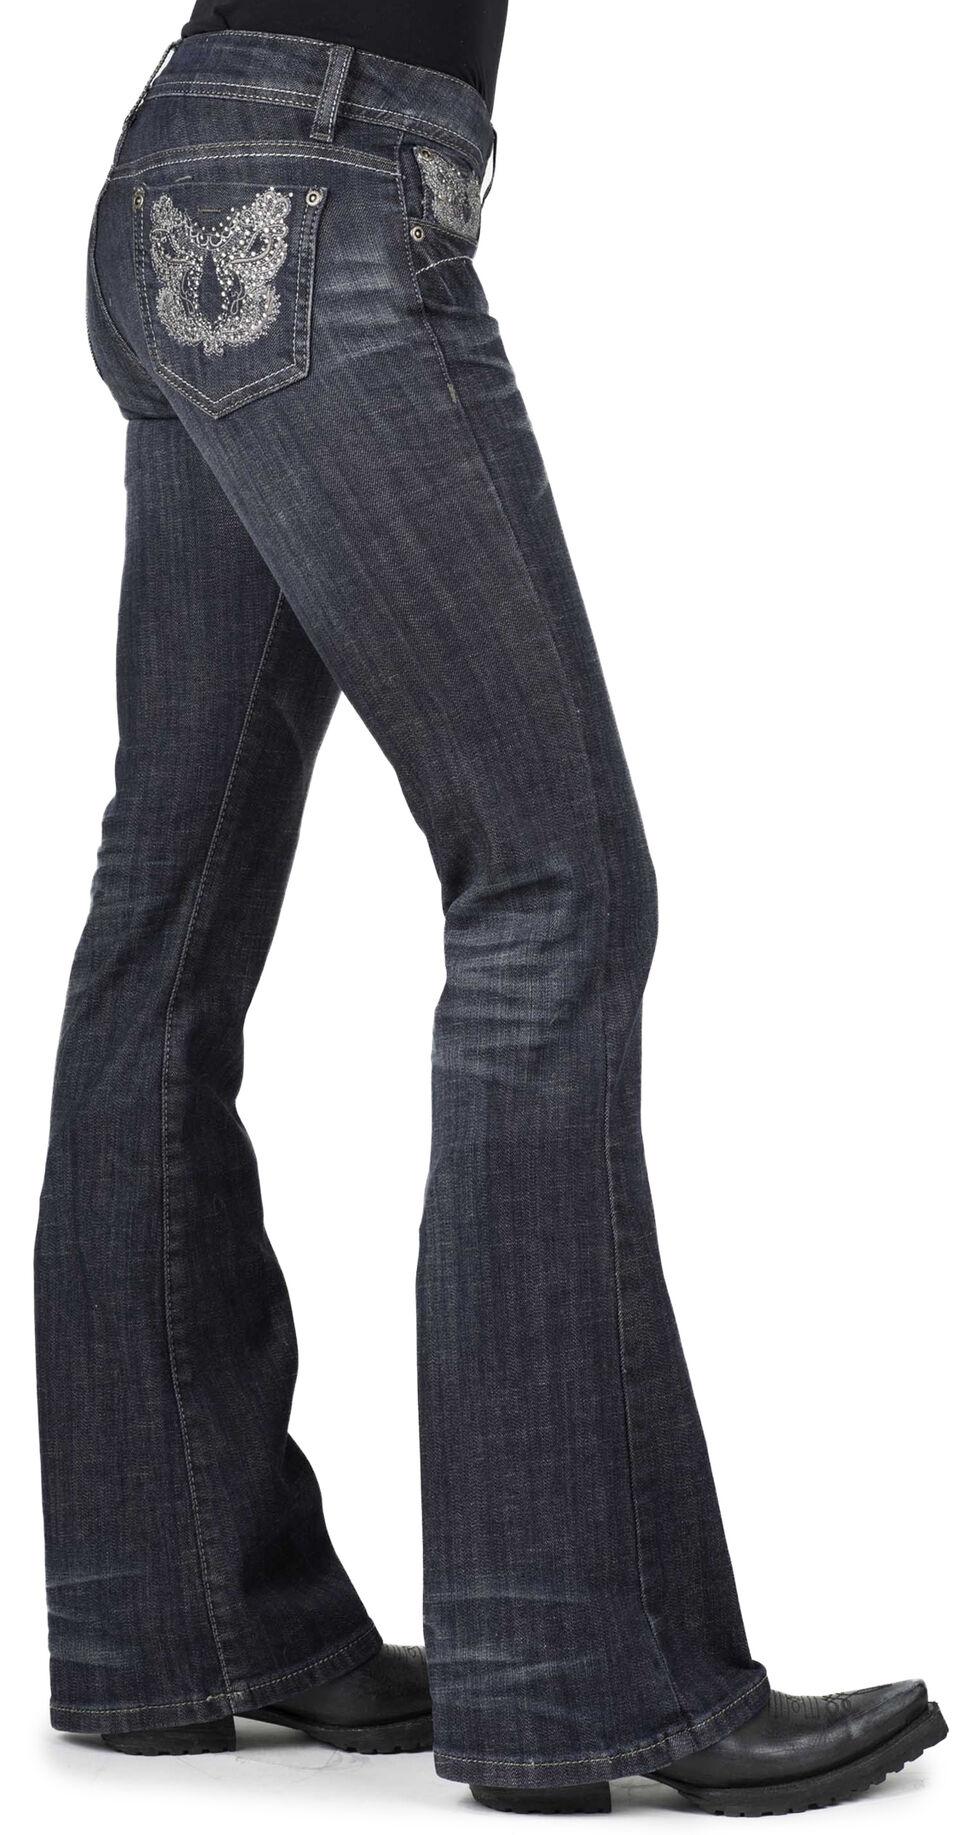 Stetson Women's 816 Metallic Stitch Jeans, Denim, hi-res